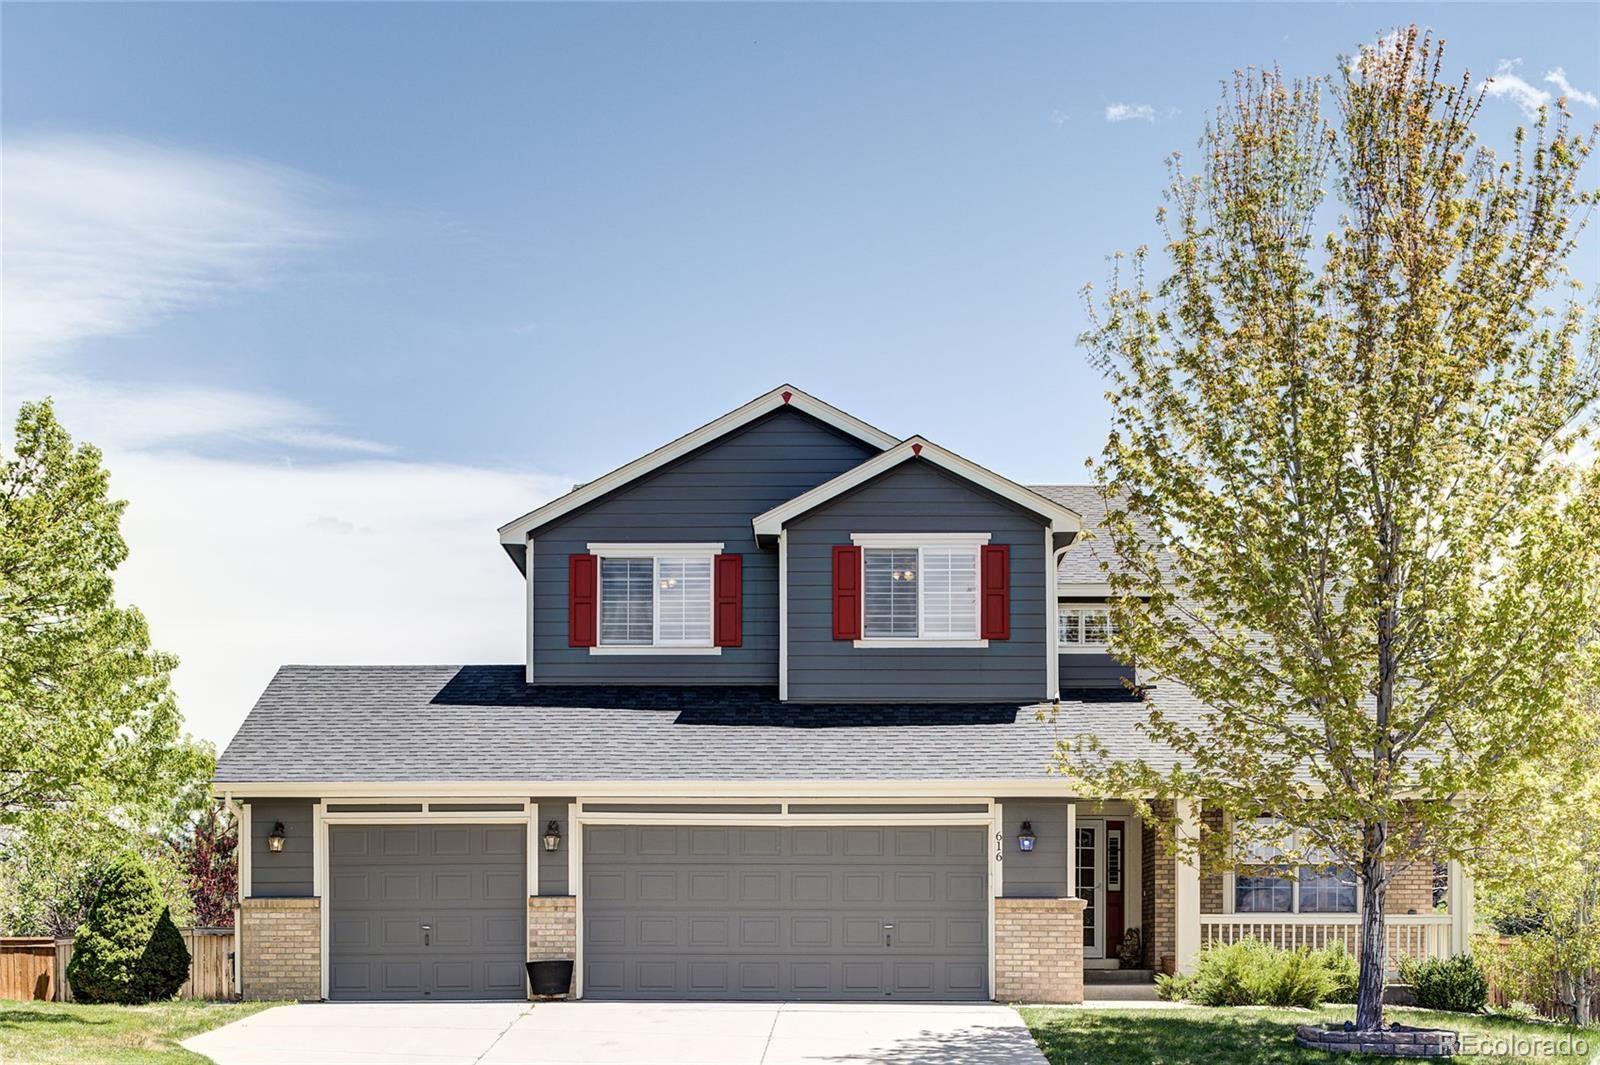 616 Blue Heron Way, Highlands Ranch, CO 80129 - #: 7919807